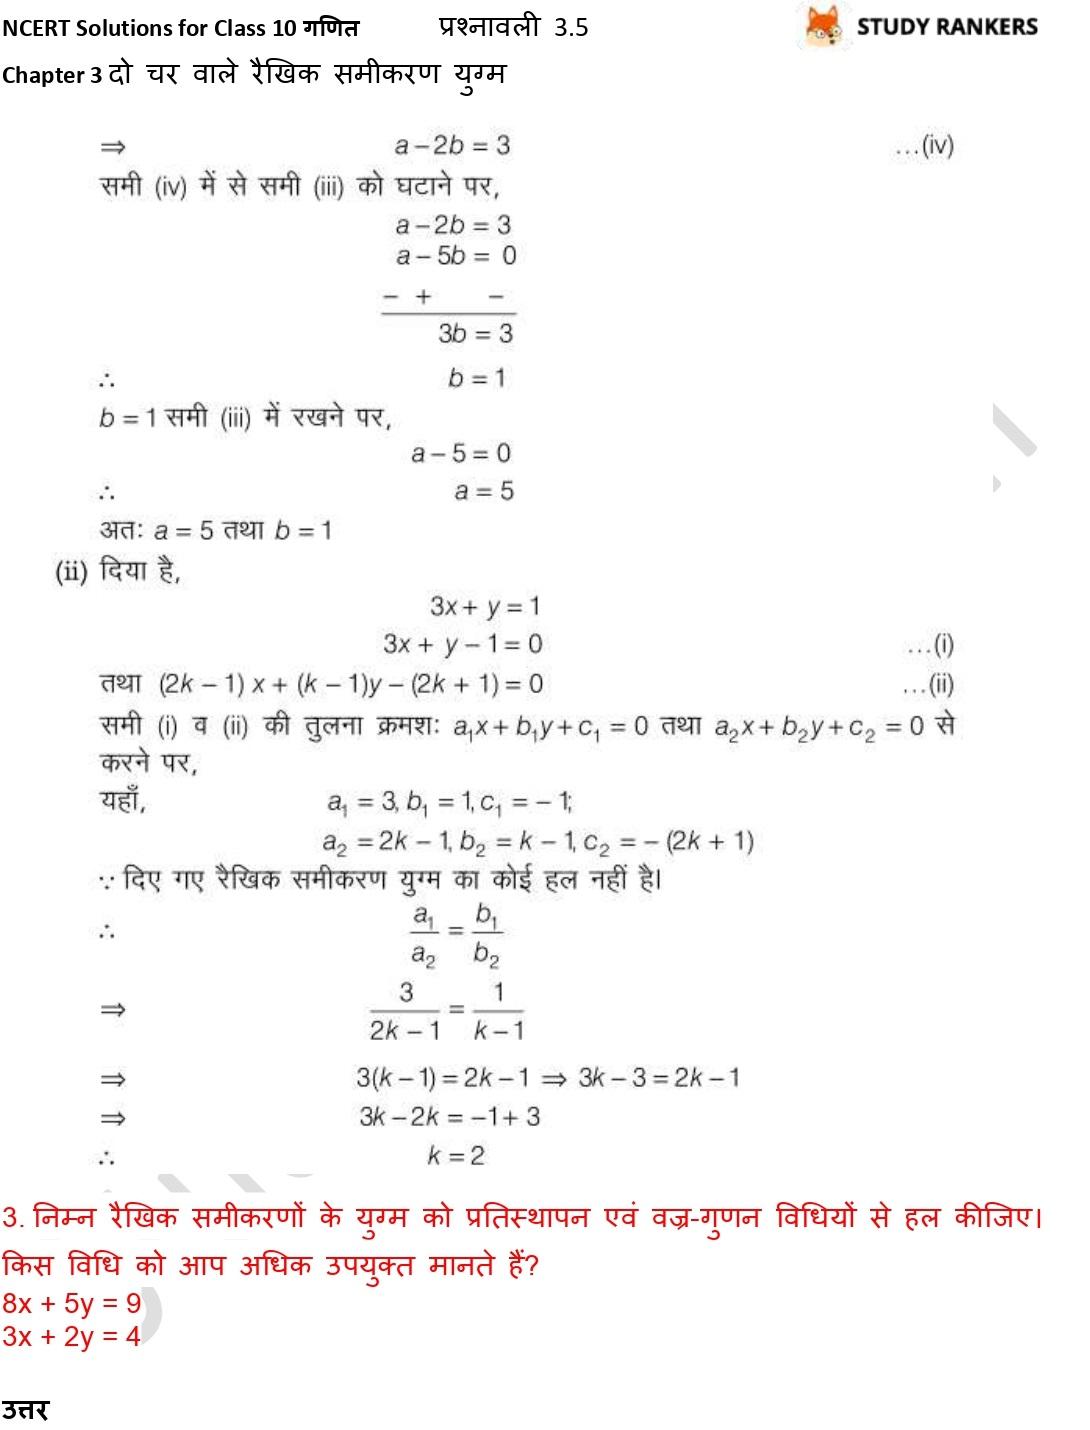 NCERT Solutions for Class 10 Maths Chapter 3 दो चर वाले रैखिक समीकरण युग्म प्रश्नावली 3.5 Part 5